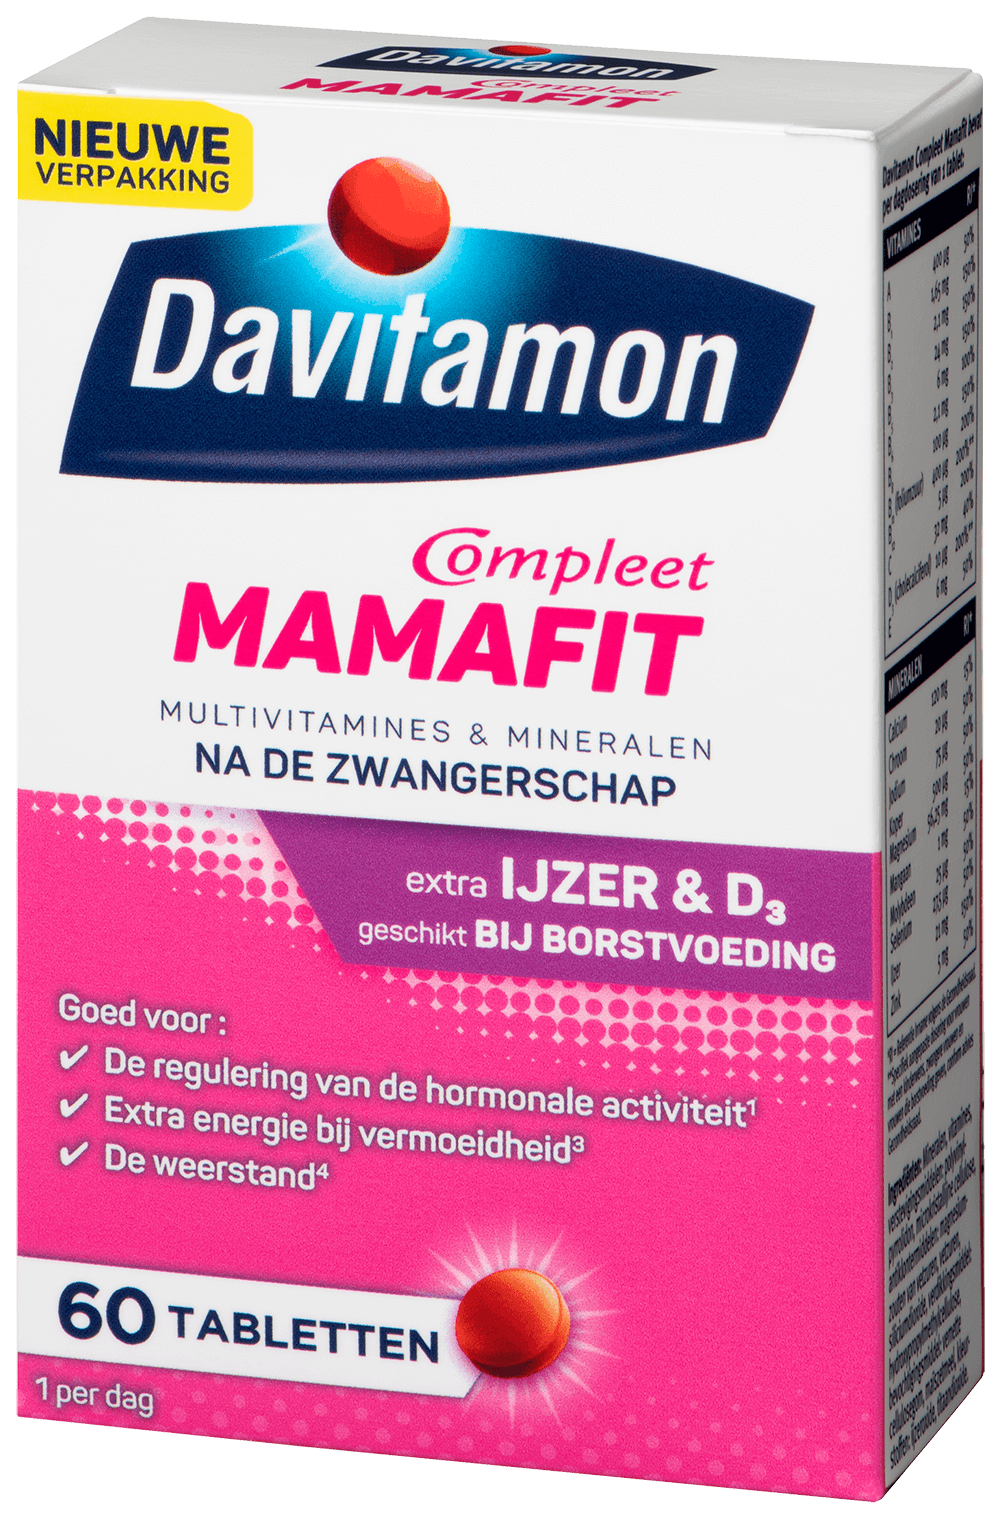 Davitamon MamaFit